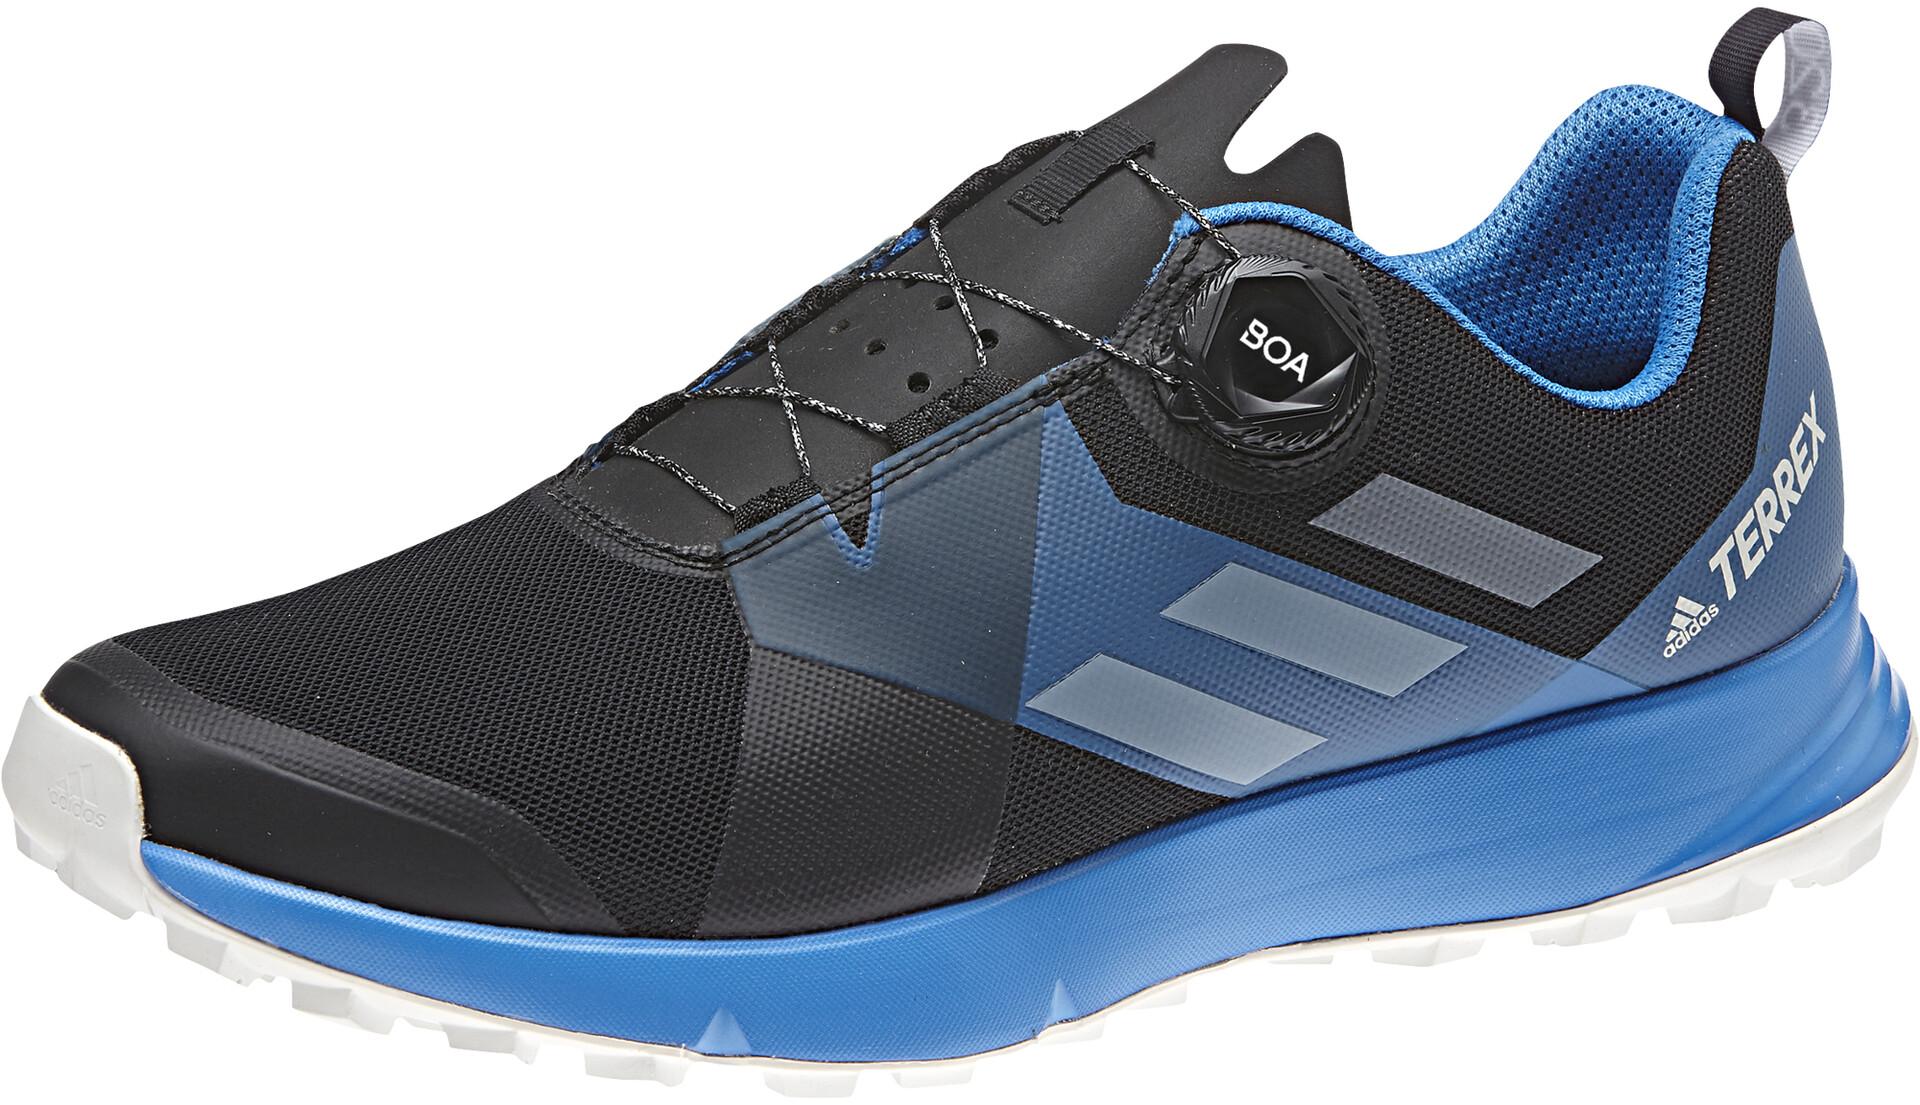 Terrex Campz Adidas Chaussures Homme Running Two Sur Bleunoir Boa 4j5RS3qcLA